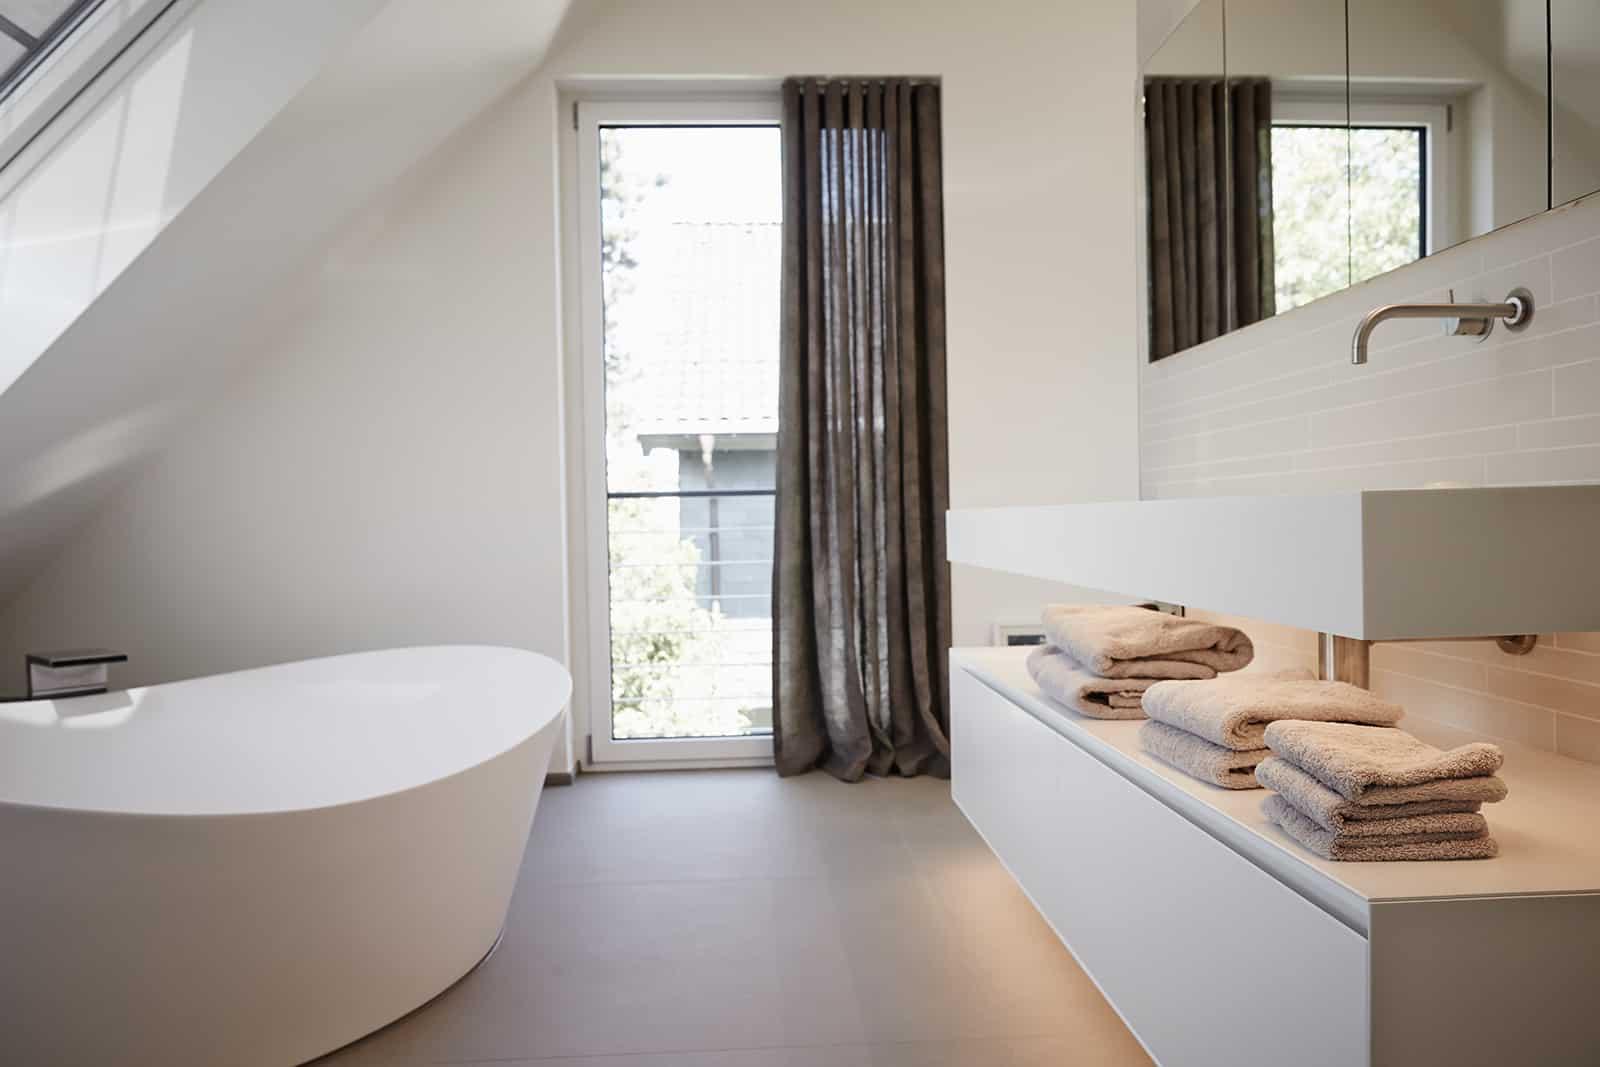 ultra modern white bathroom designed and installed by eggersmann